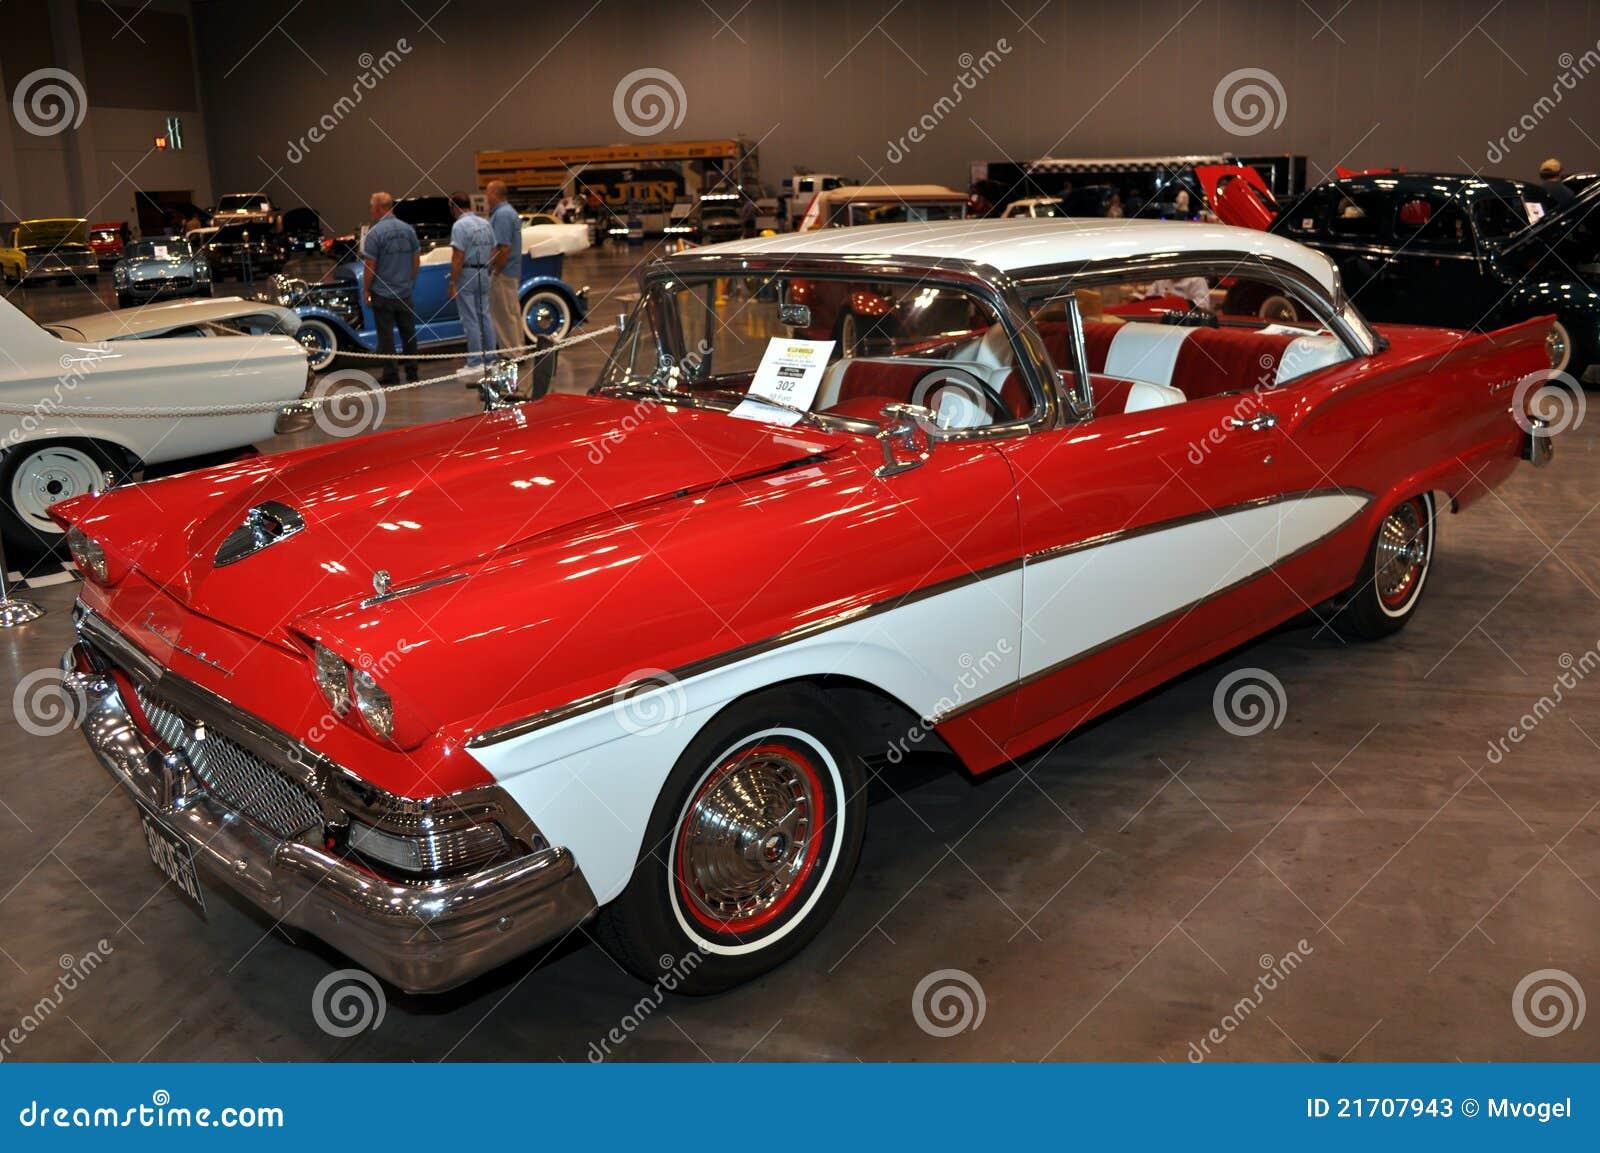 Car Show At Virginia Beach Convention Center Som Scxhjdorg - Car show at virginia beach convention center